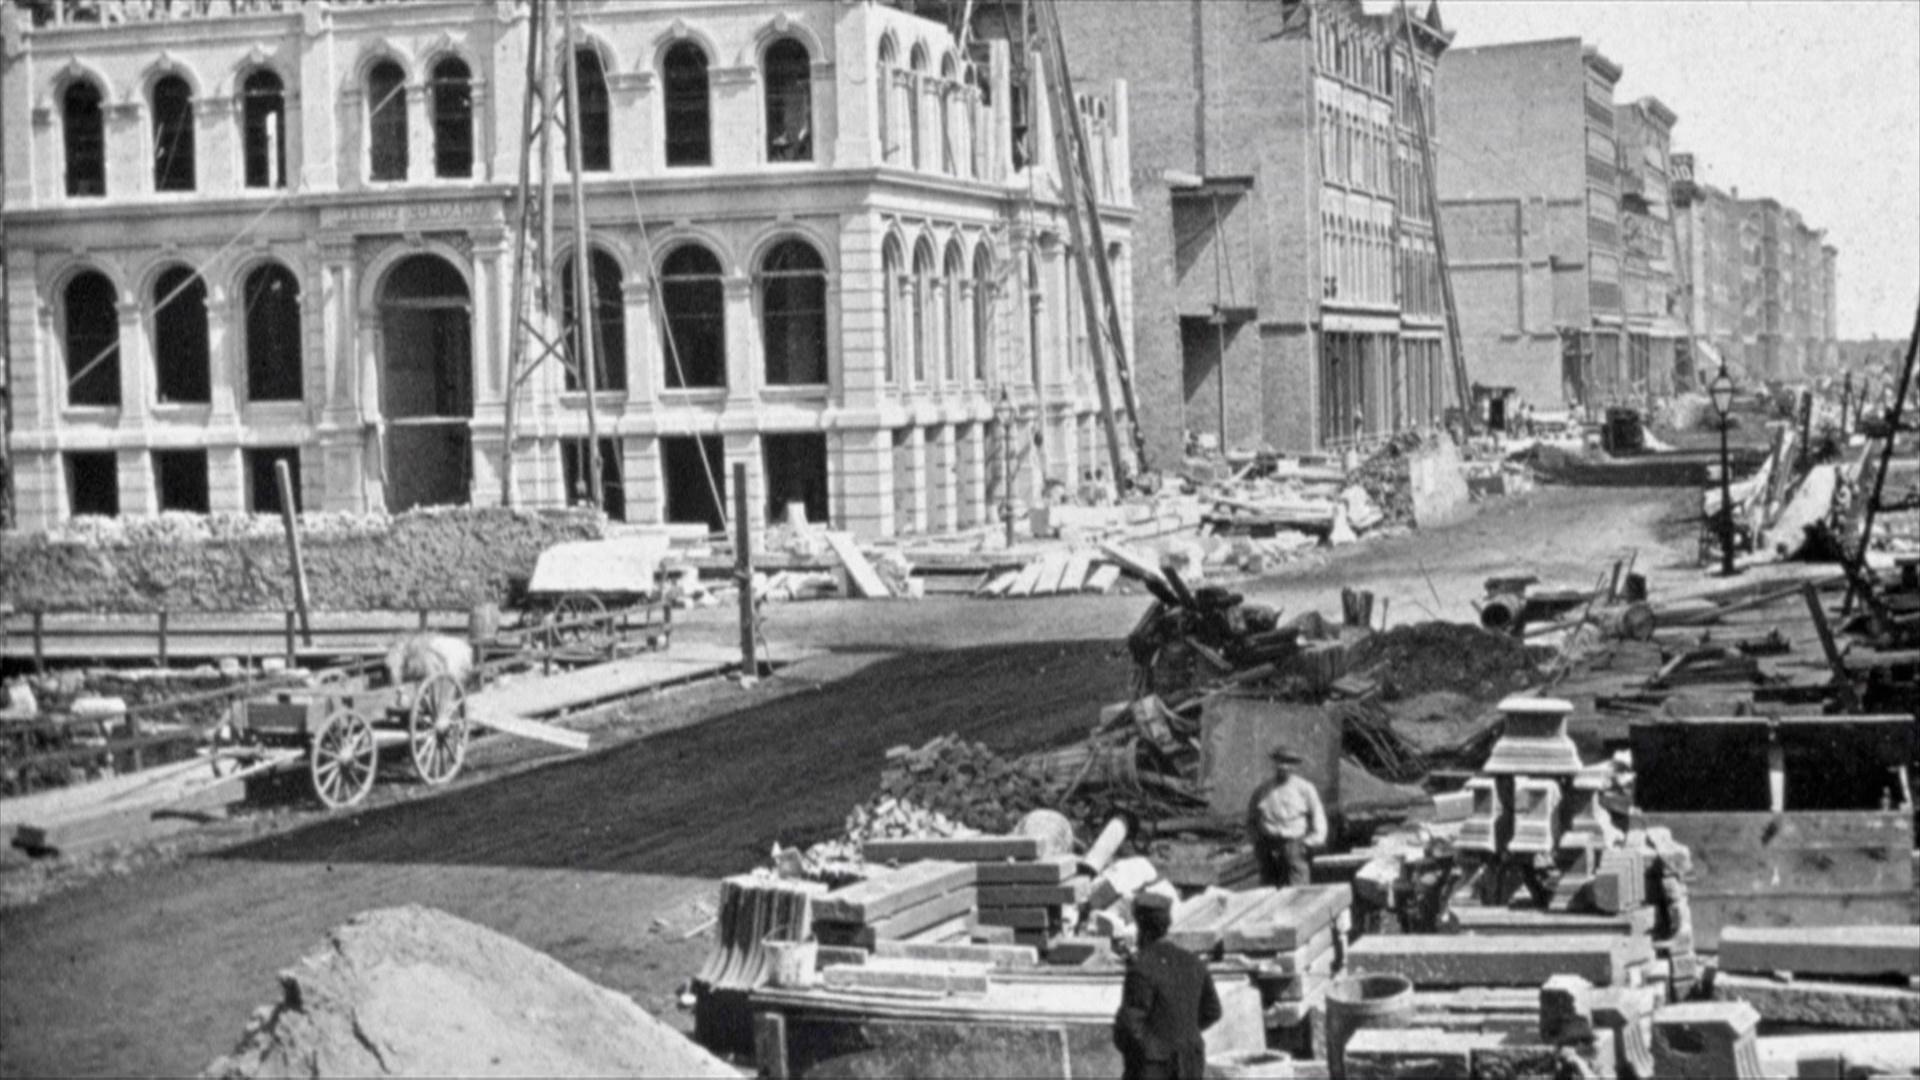 Rebuilding the City